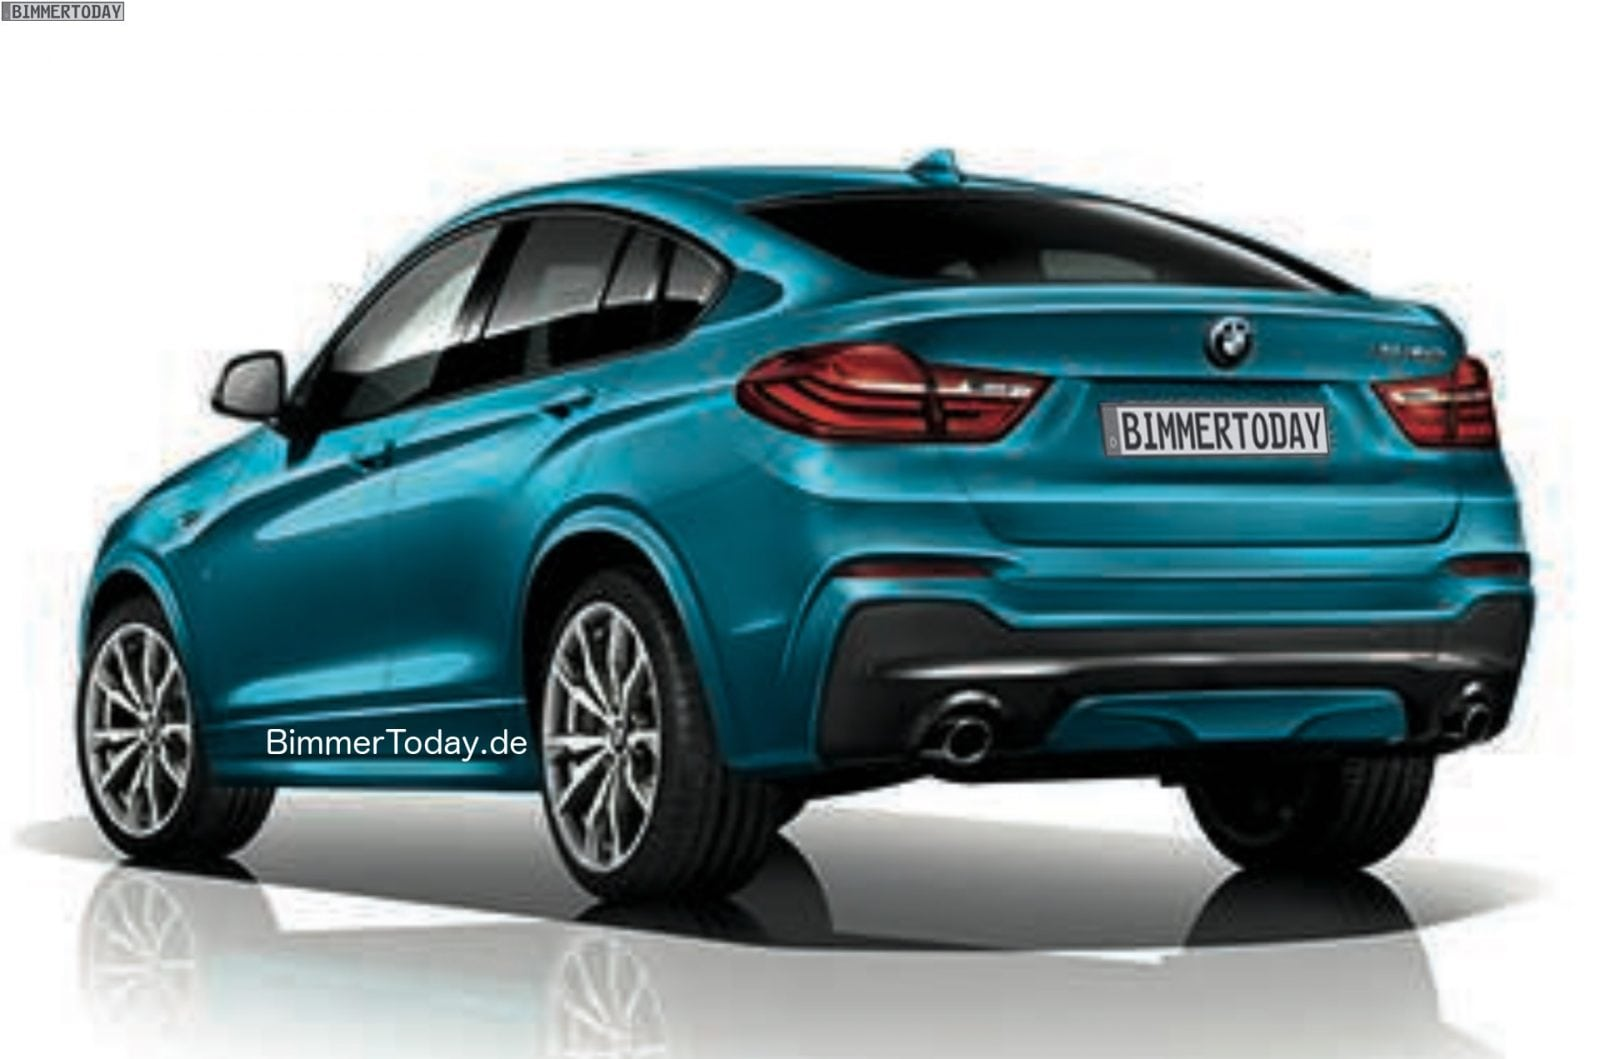 BMW X4 M40i 2015 Утечка от BimmerToday